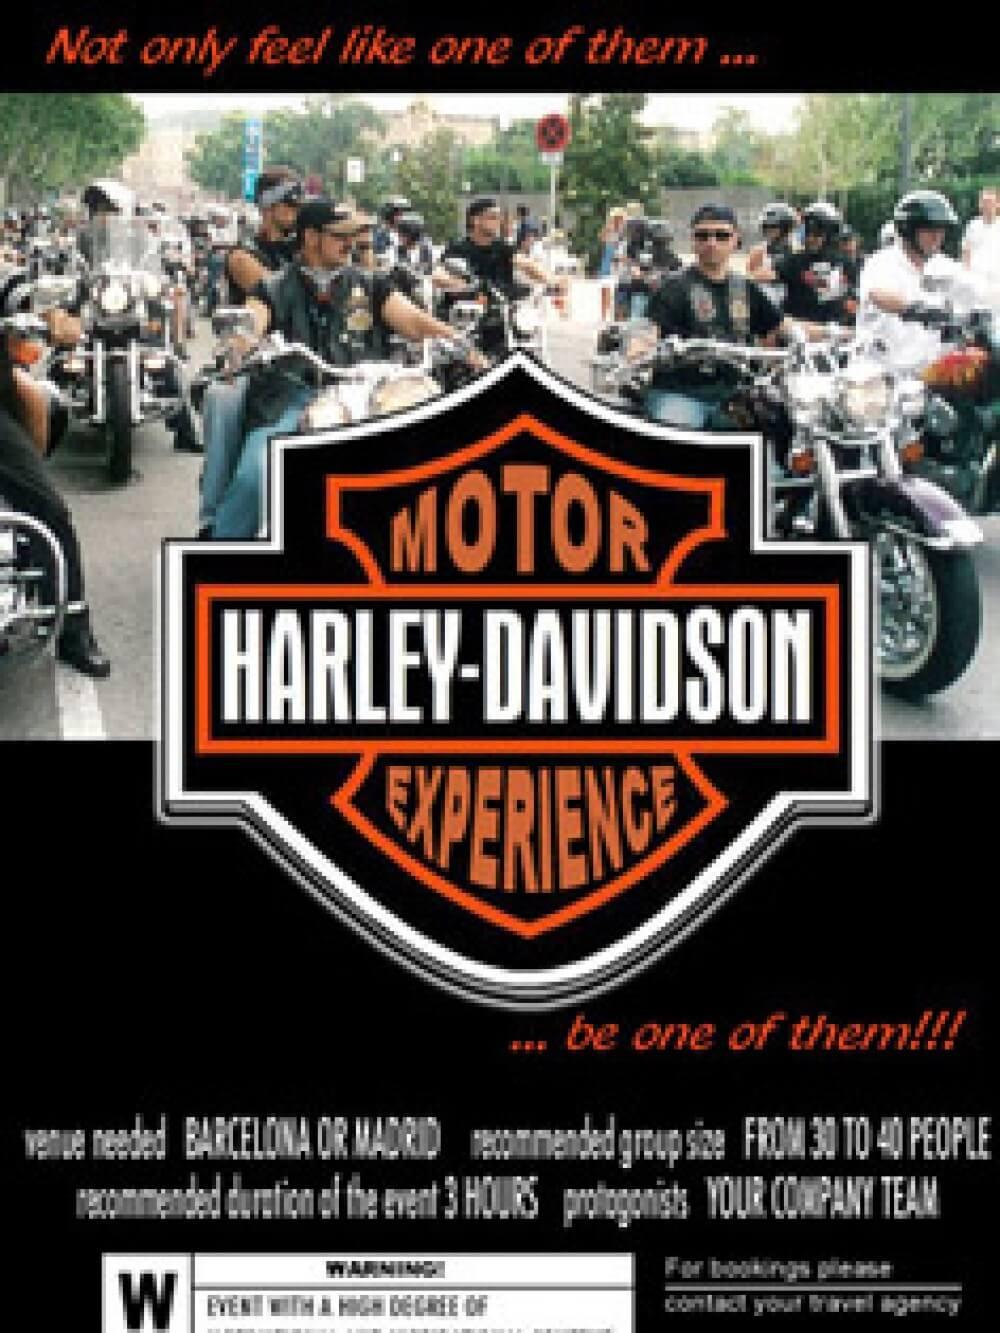 harley_davidson_experience_vertical_web